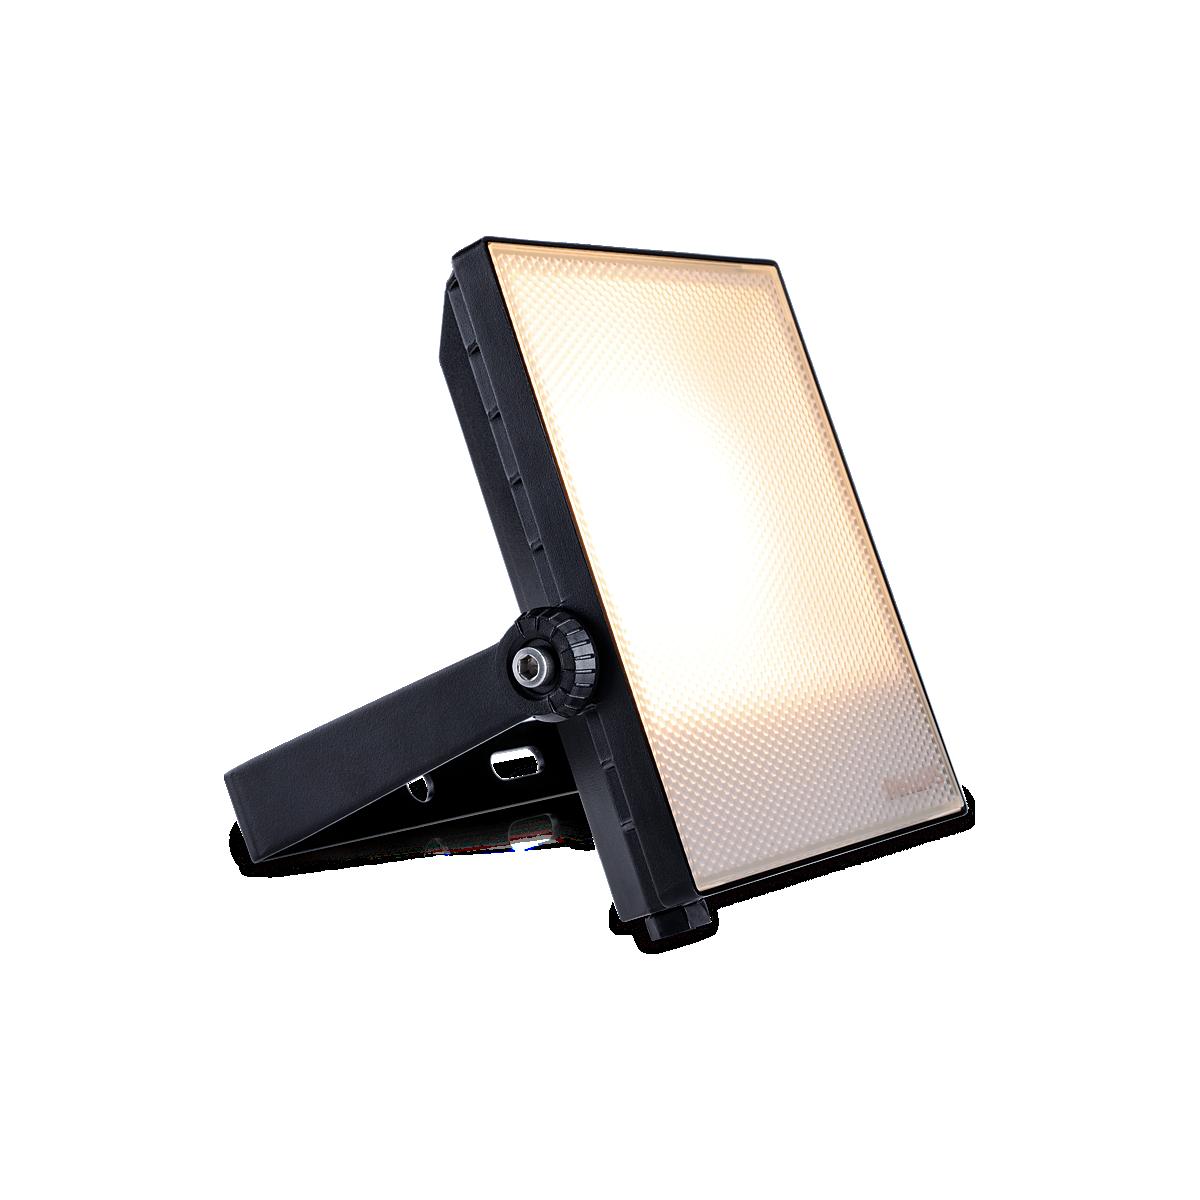 Essential SmartBright G2 LED Floodlight